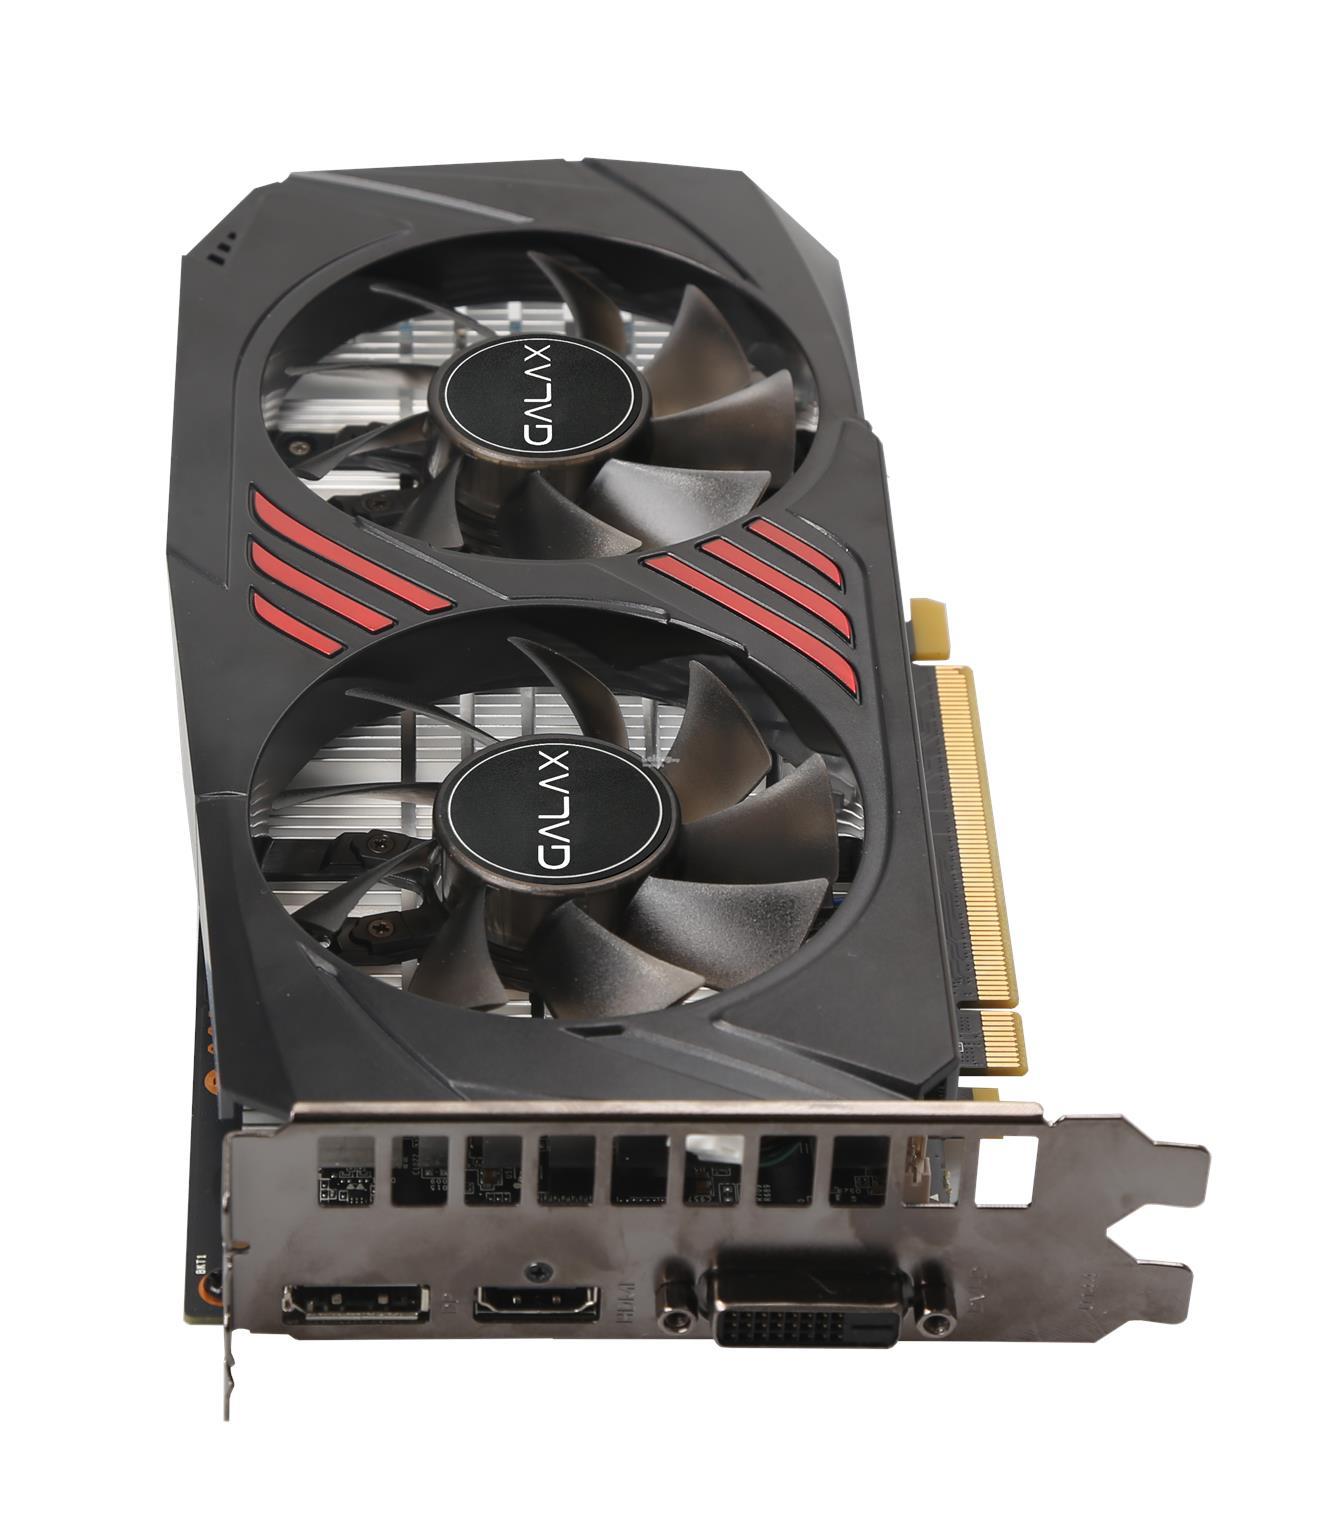 # GALAX GeForce® GTX 1060 OC 6GB Red Black Ed  # 6GB/GDDR5X | 1733MHz